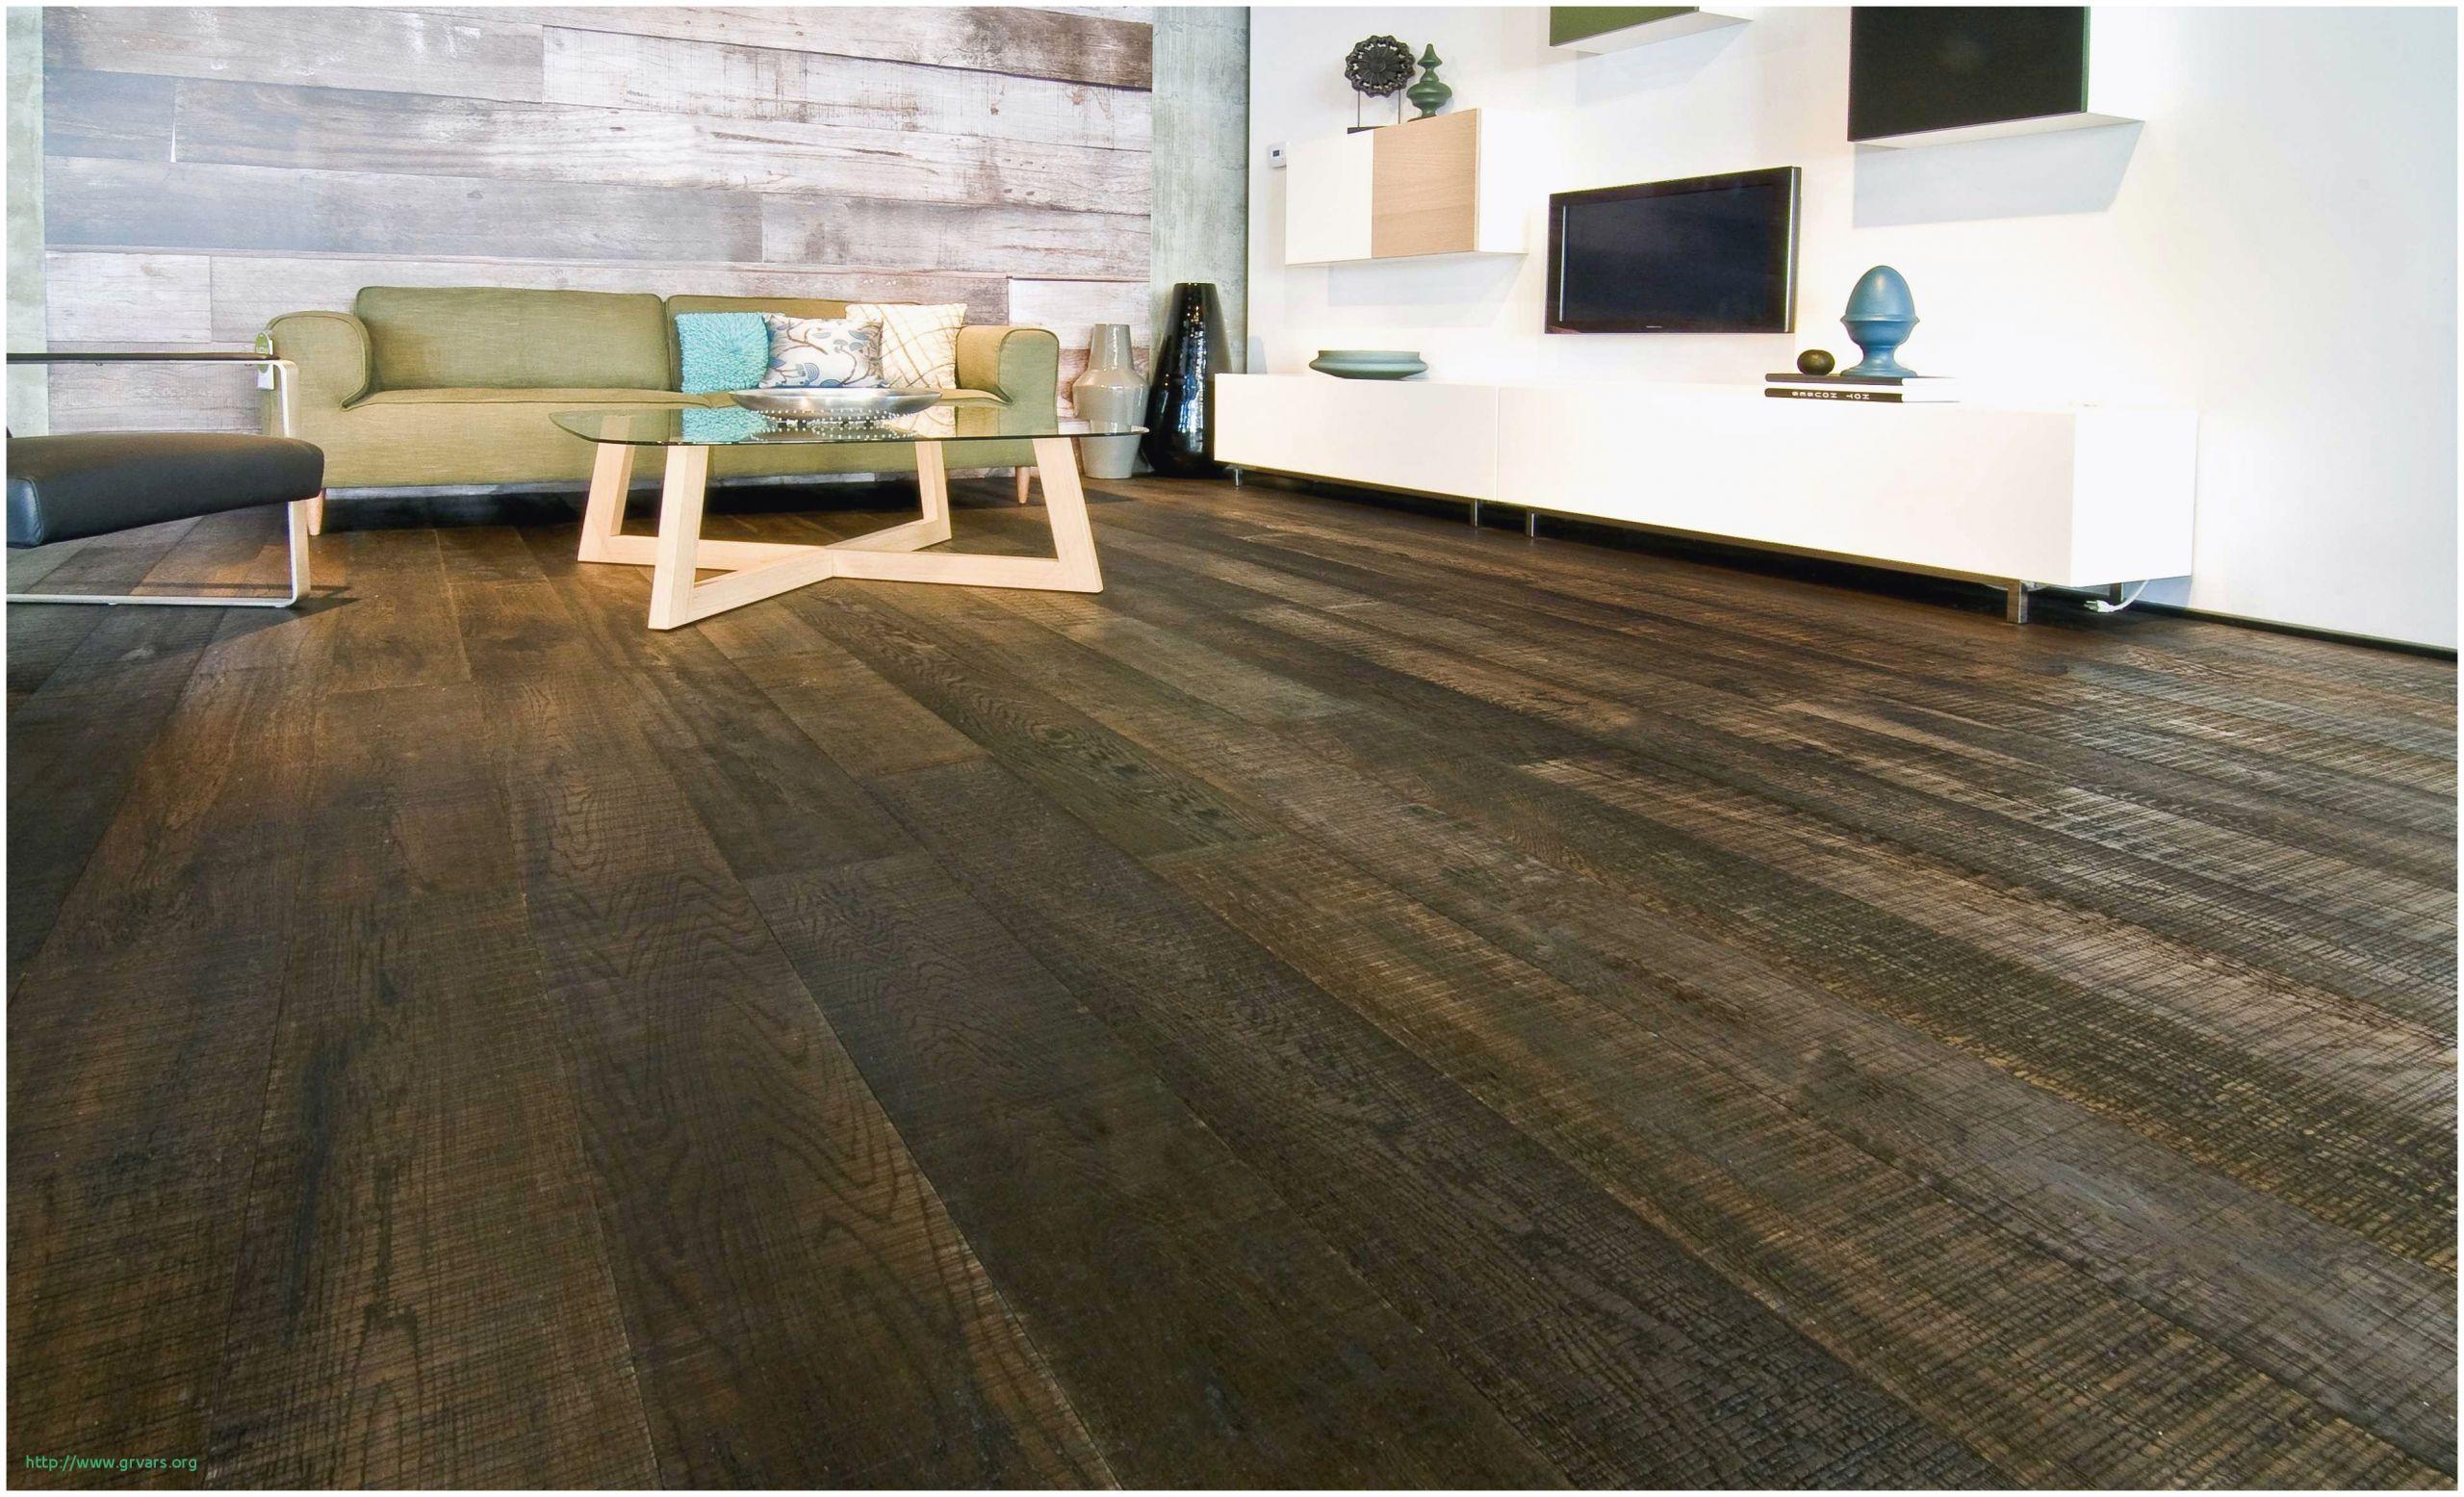 Bedroom Set On Amazon Of Bedroom Set In 2020 Installing Hardwood Floors Vinyl Flooring Prices Solid Hardwood Floors